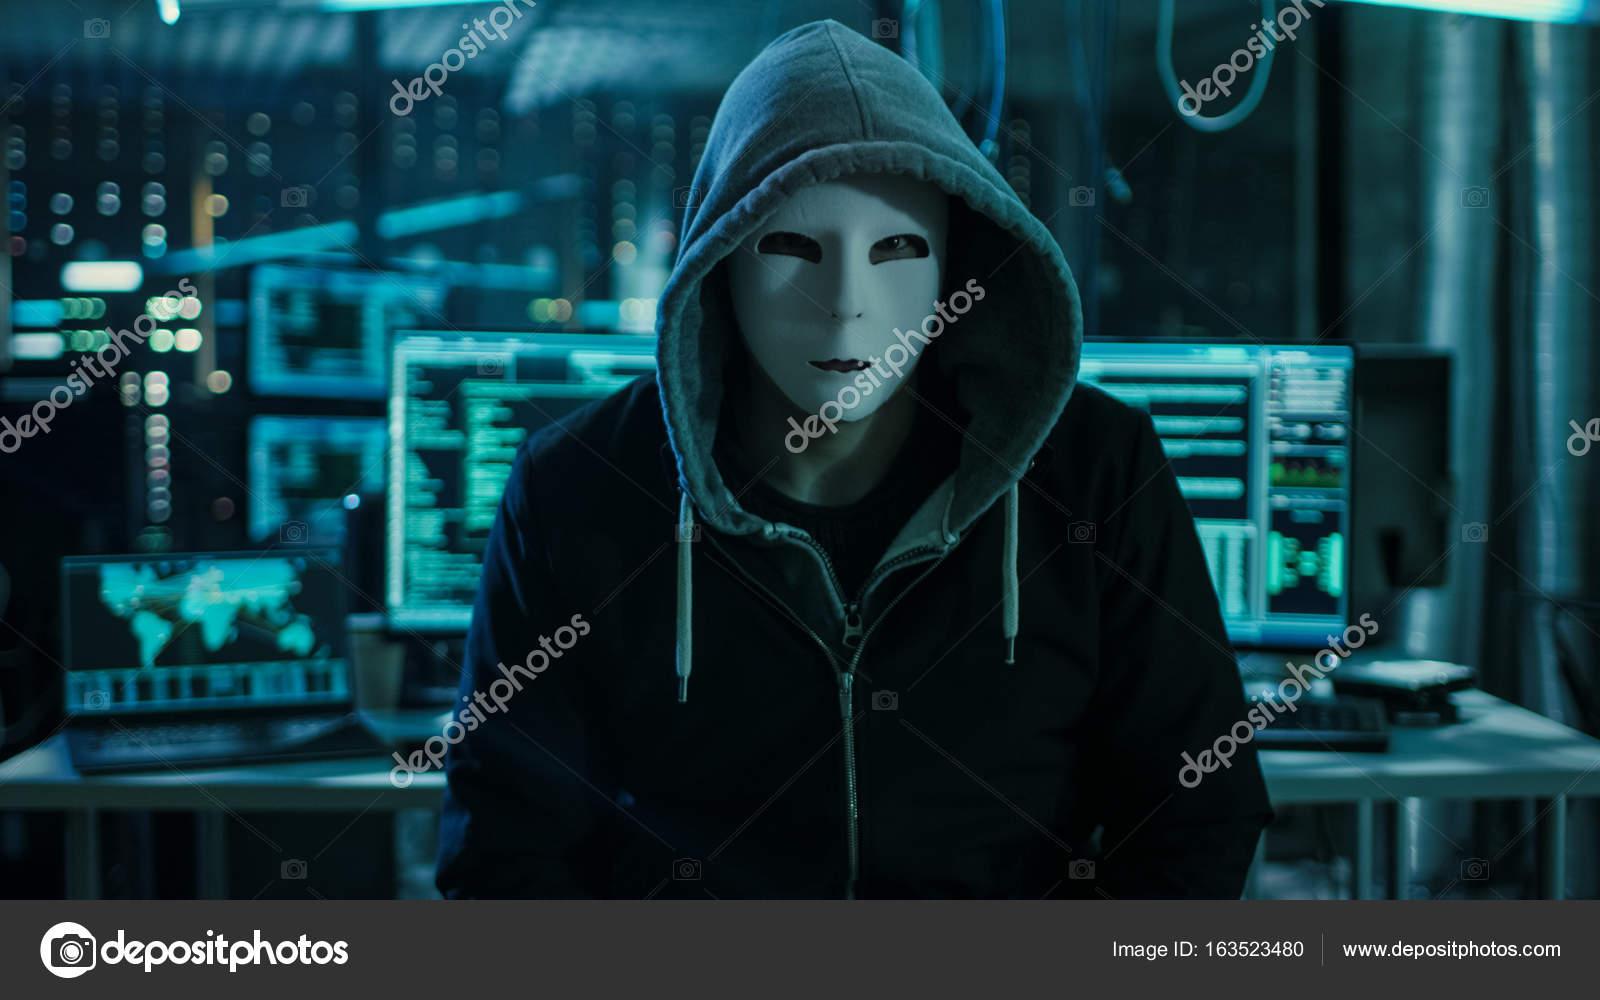 06635457ed Επικίνδυνα διεθνώς ήθελε χάκερ με καλυμμένο πρόσωπο Lookin– εικόνα αρχείου